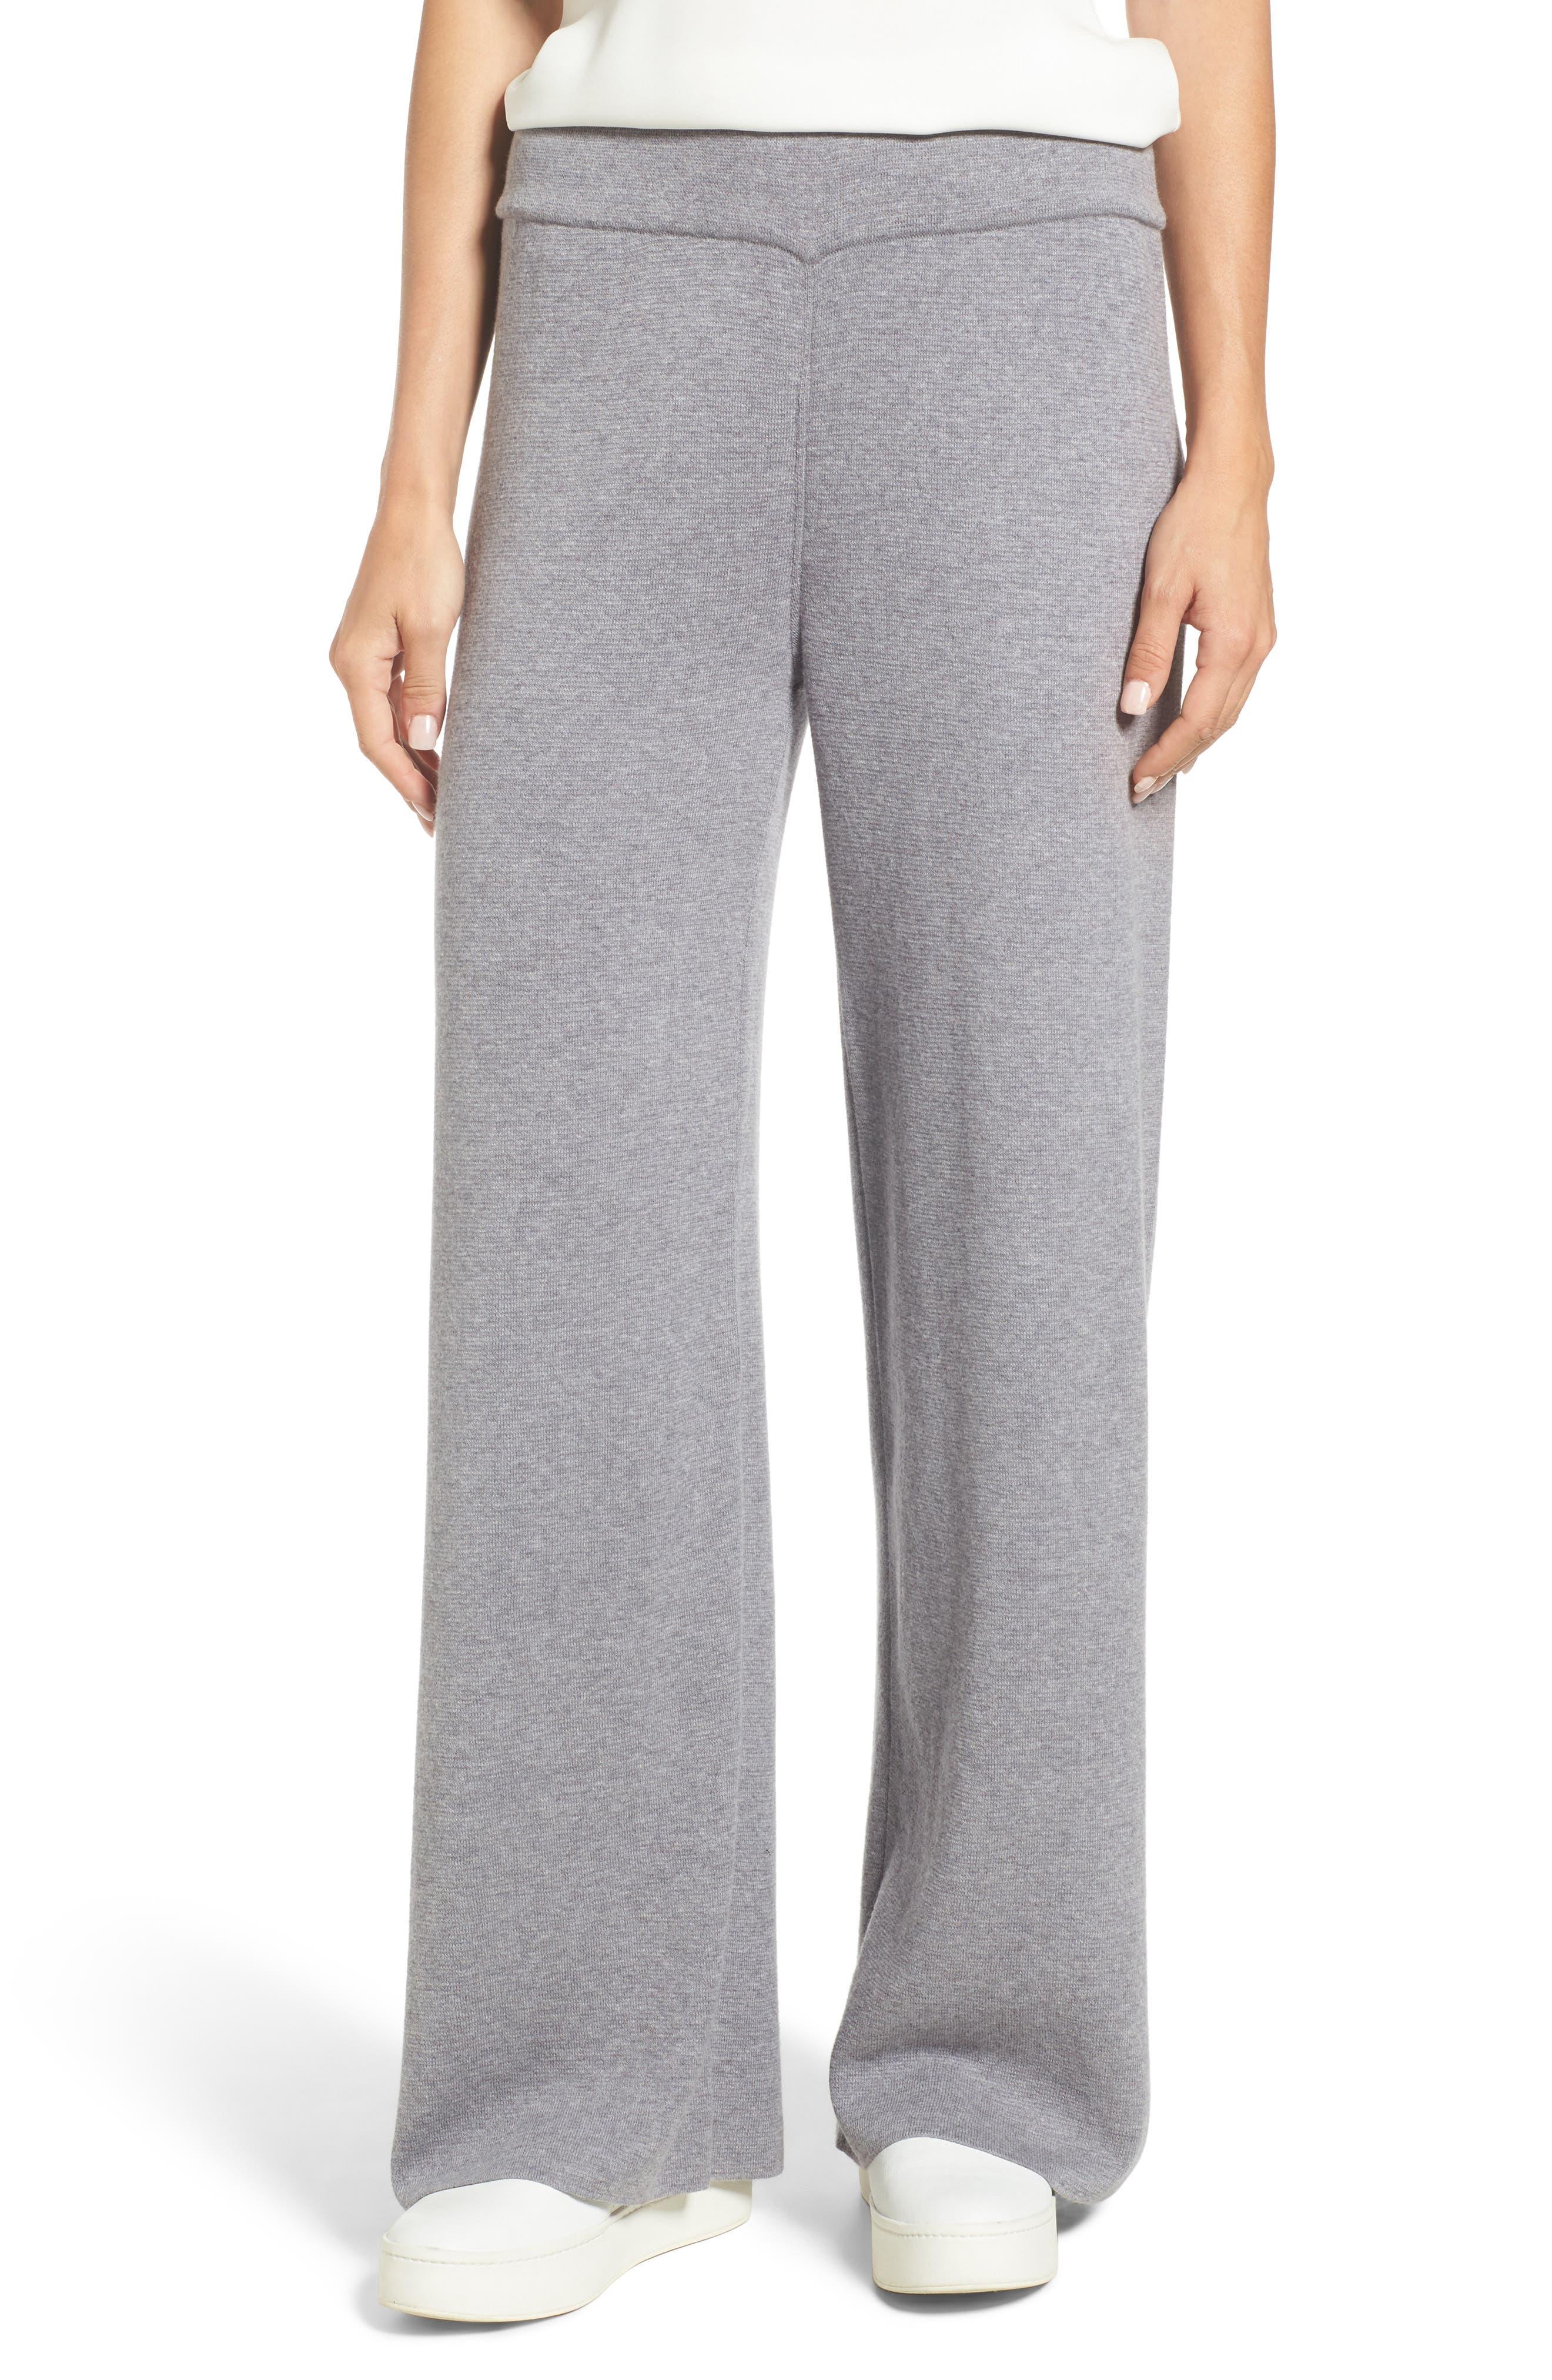 Heathered Knit Pants,                         Main,                         color, WARM GREY